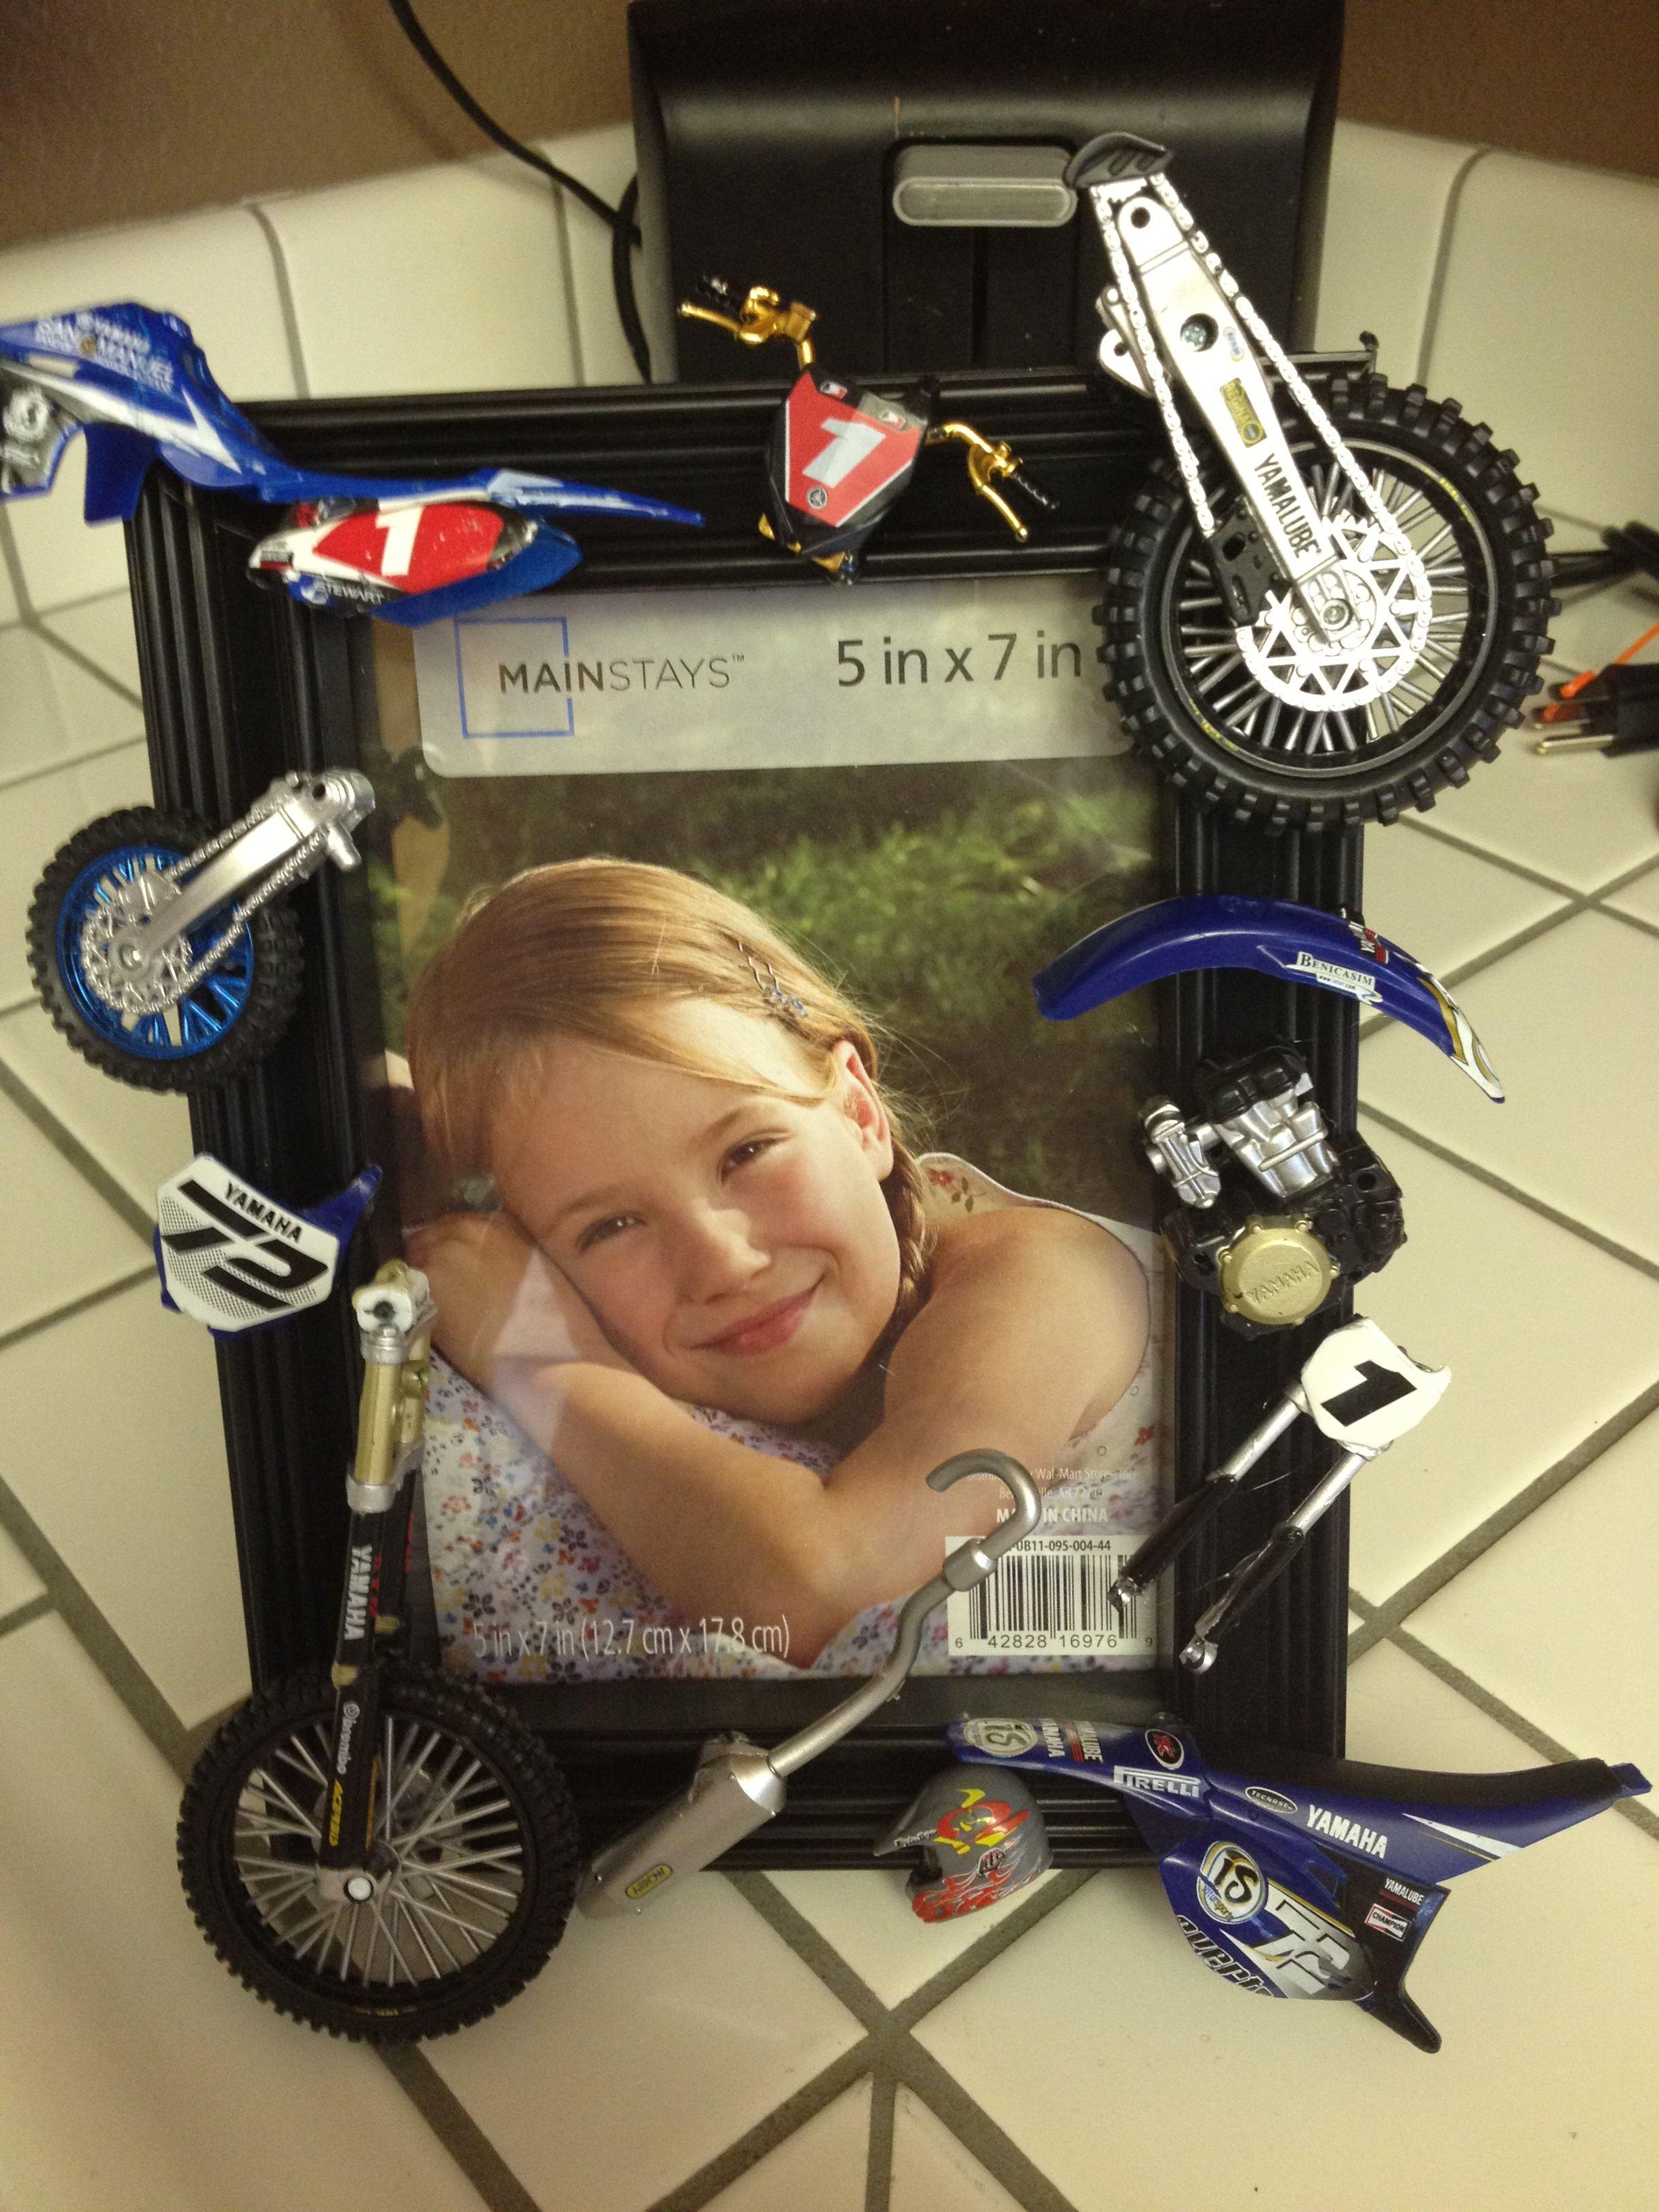 Broken Dirt Bikes Make A Frame From The Toys For Boys